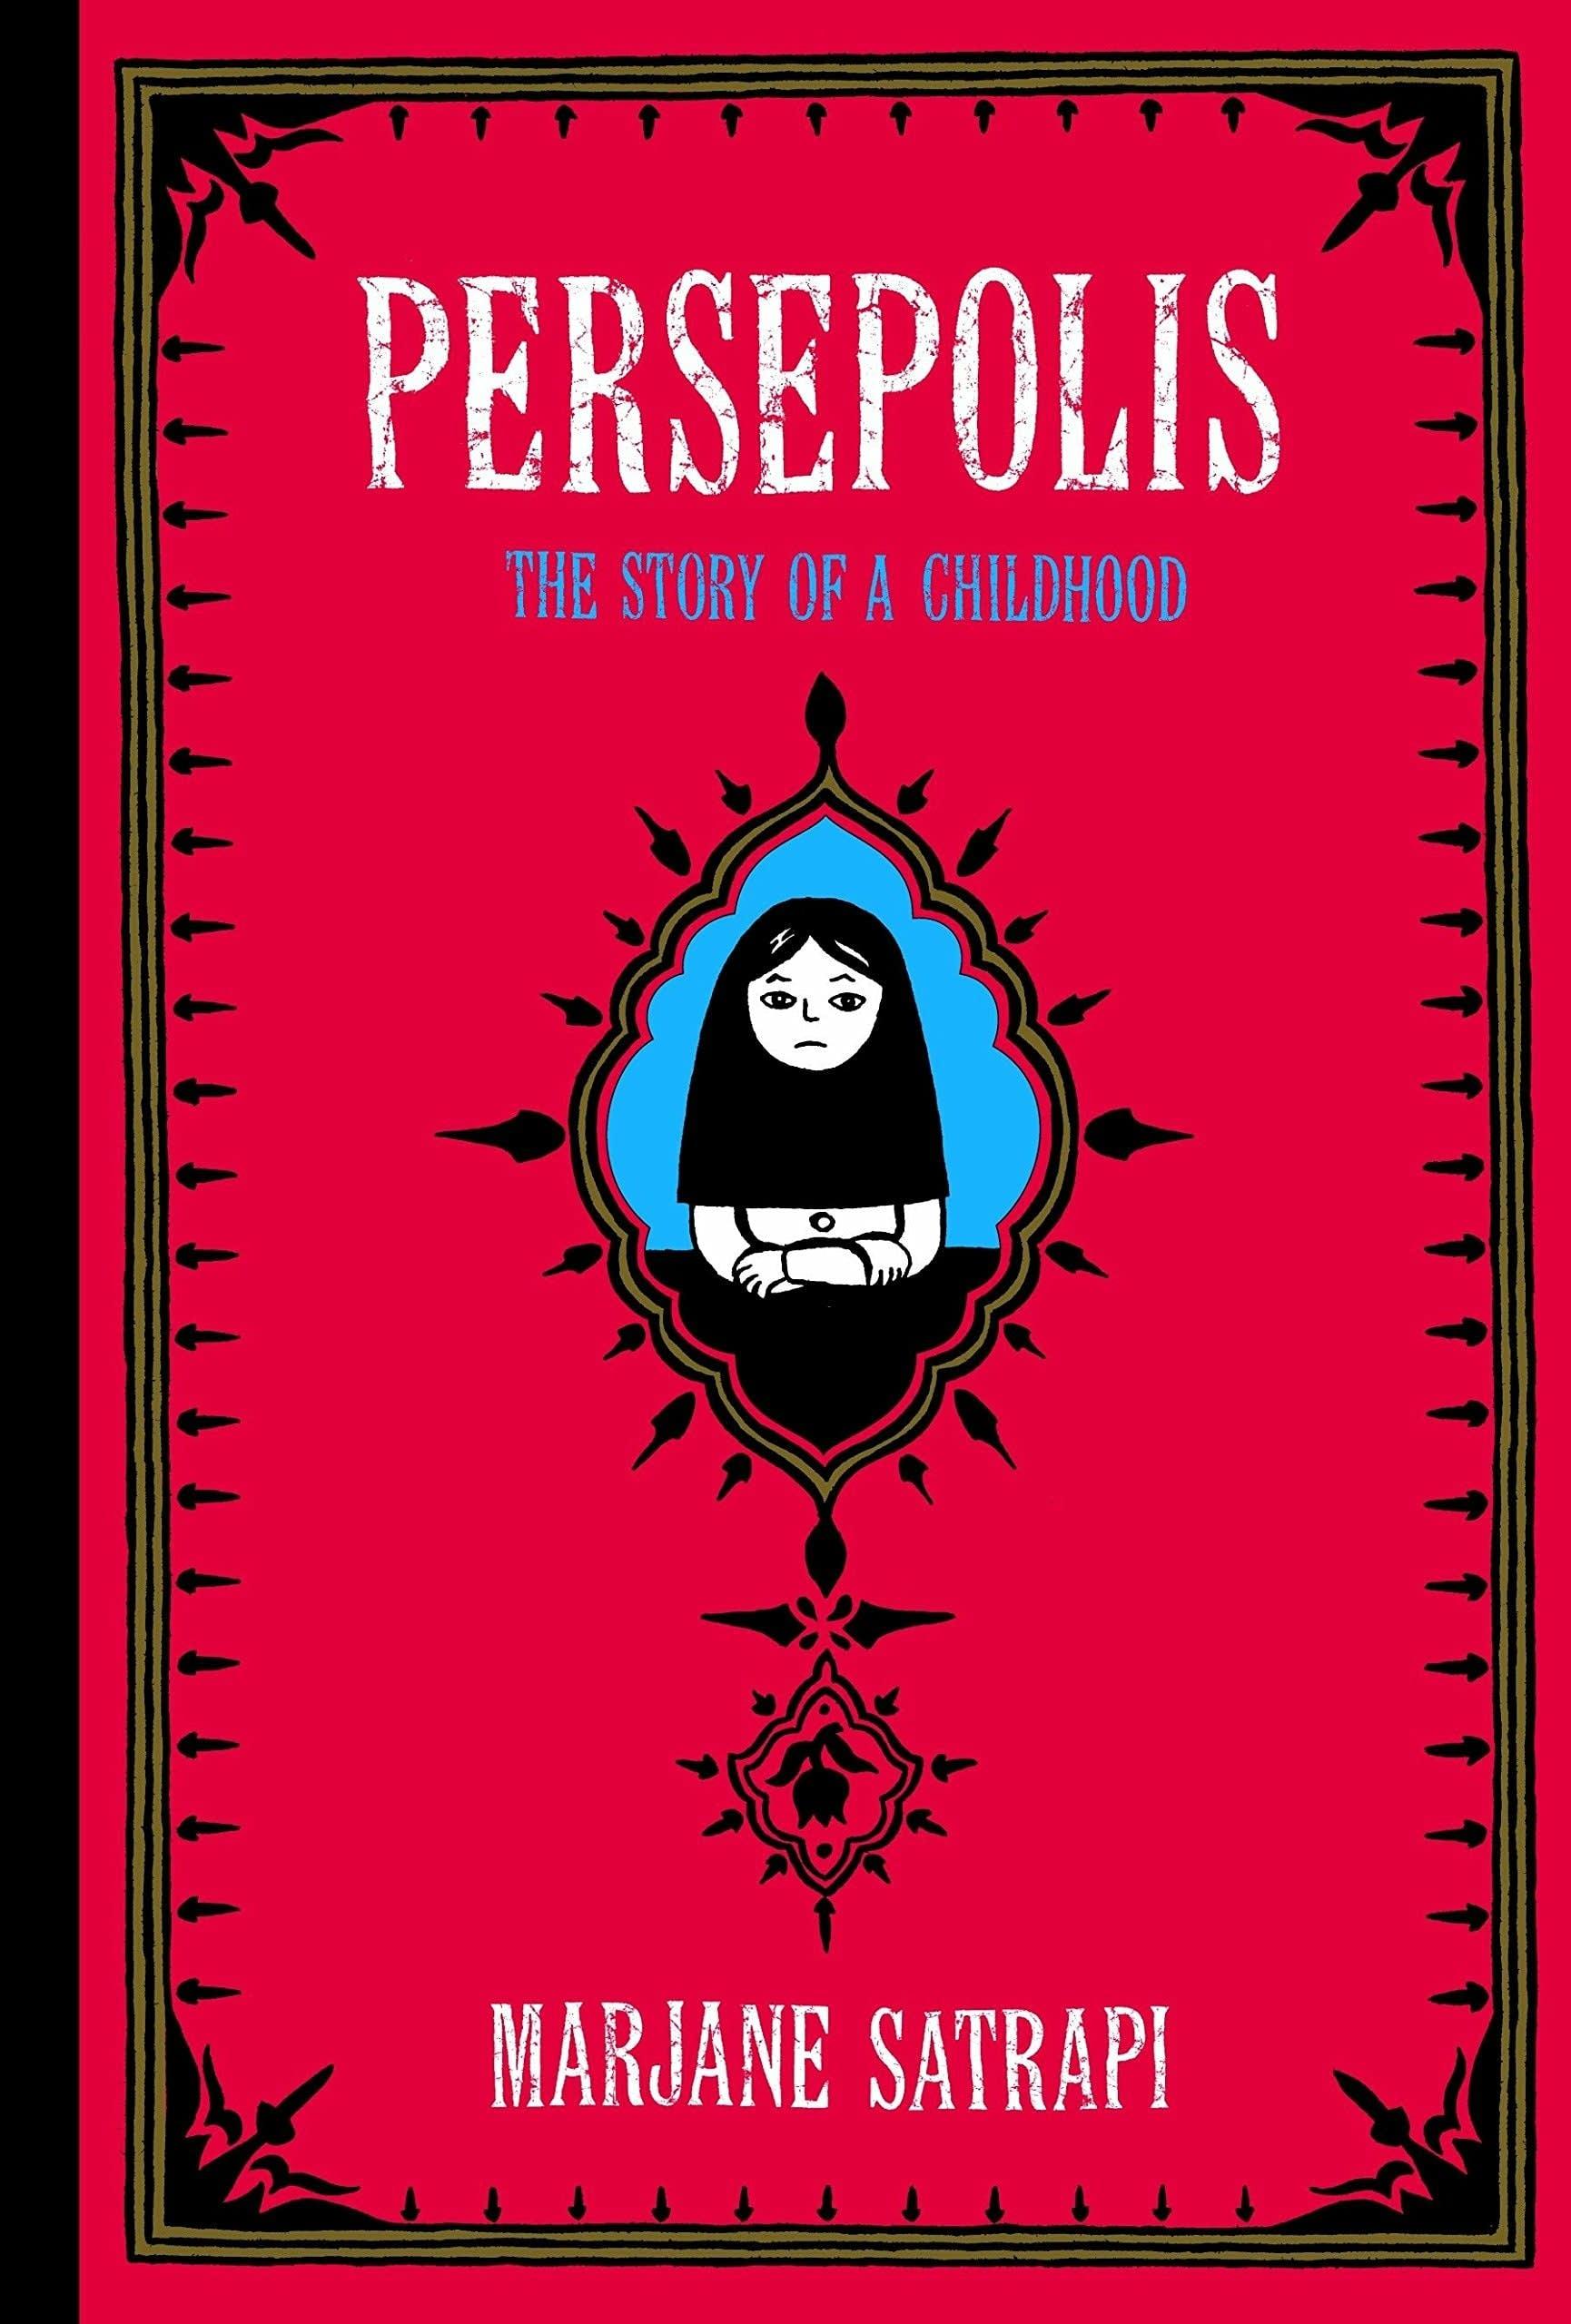 Persepolis by Marjane Satrapi